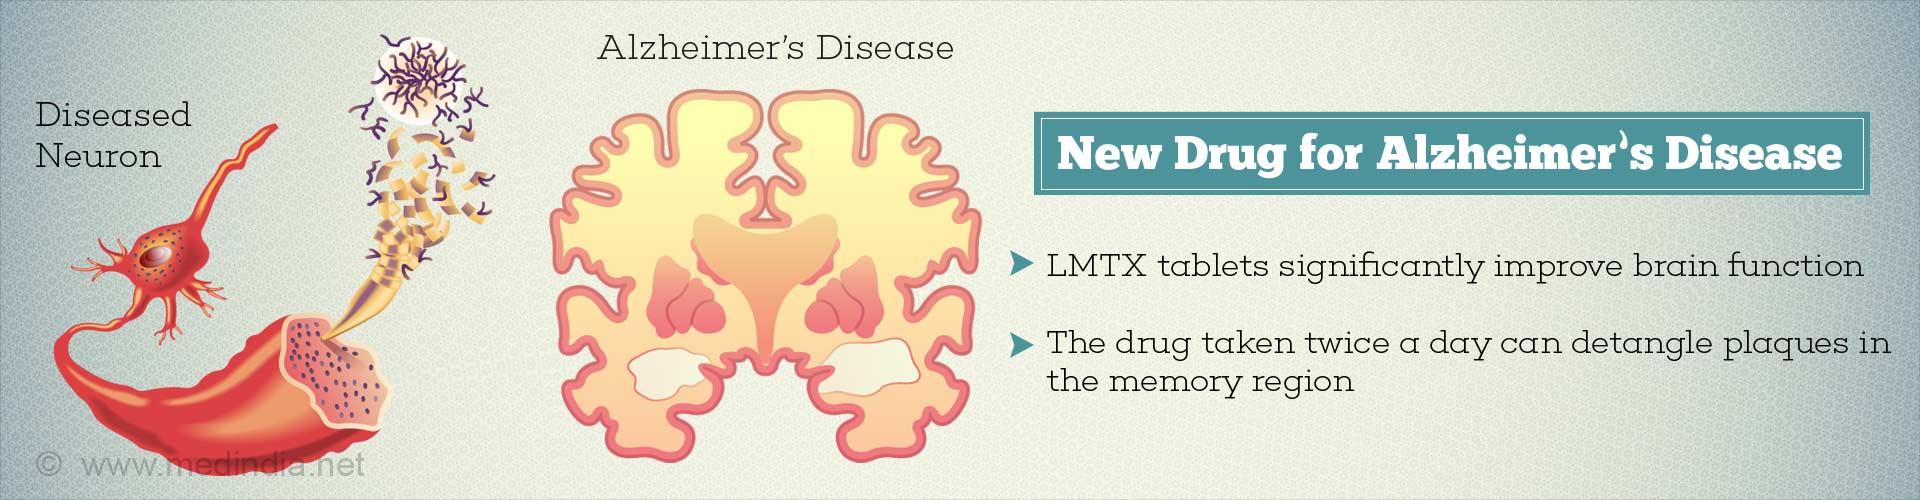 Alzheimer's Disease: LMTX Tablets Repair Brain Damage and Restore Brain Function